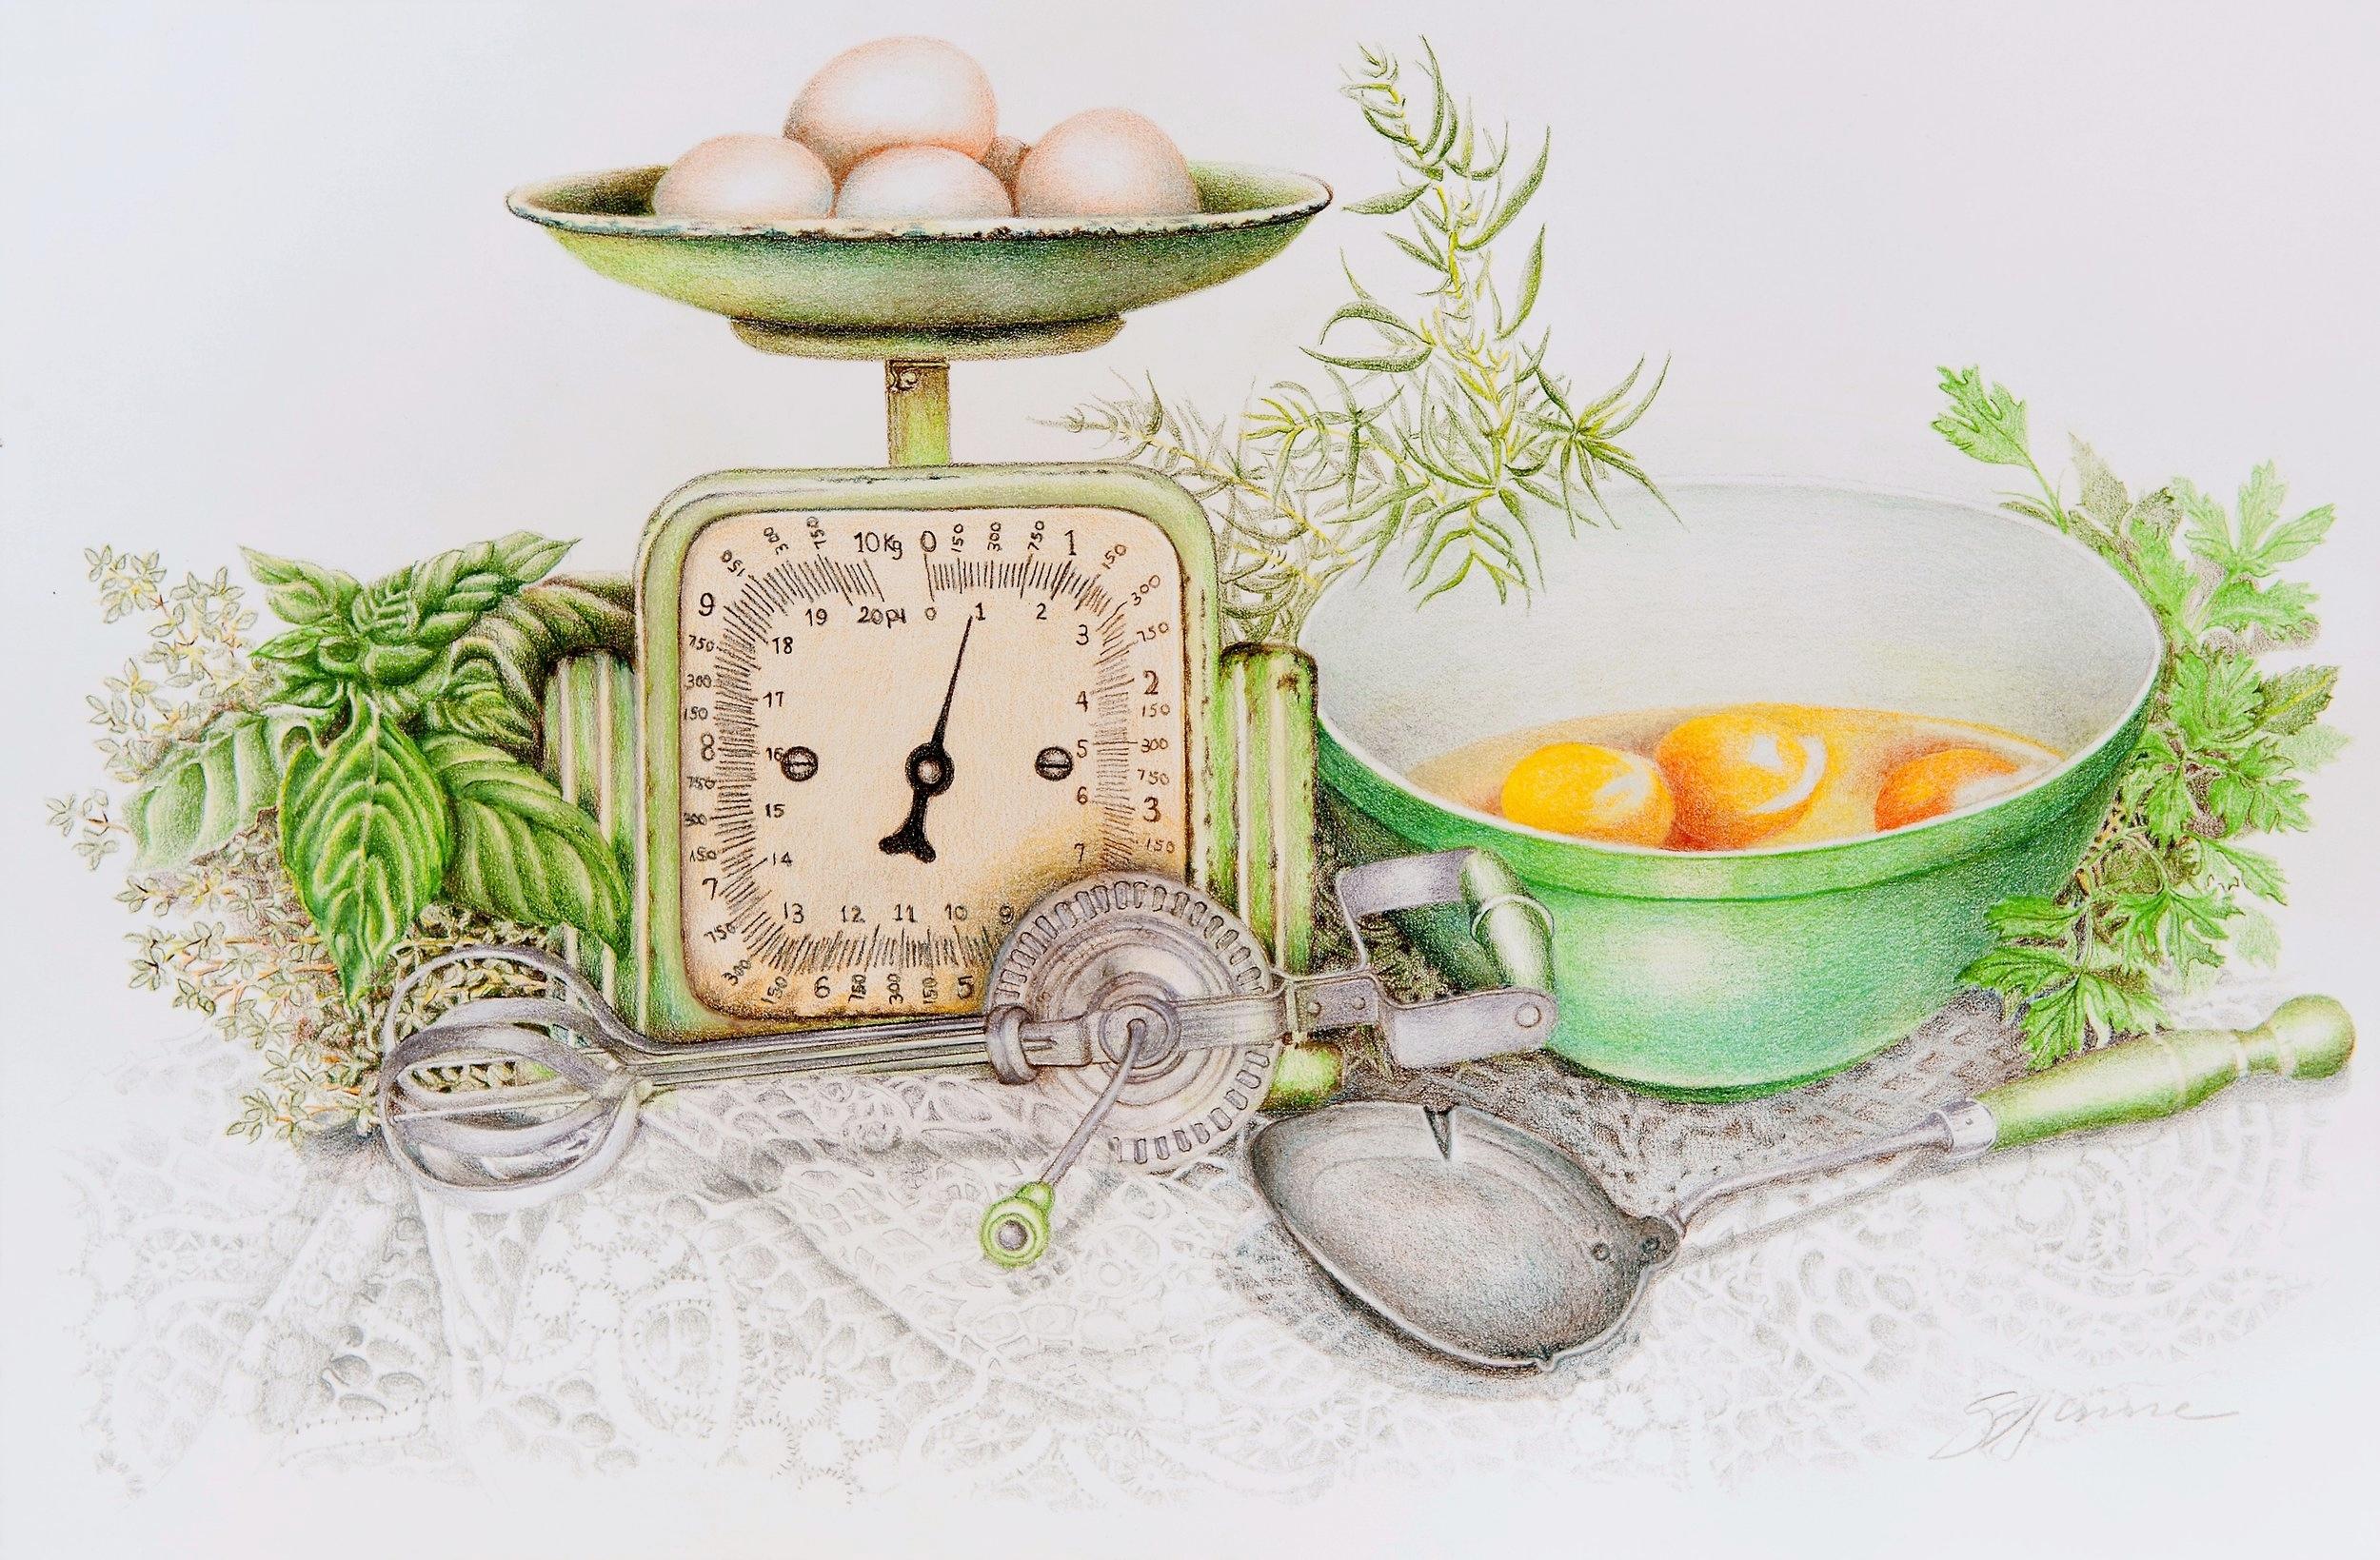 Eggs and herbs.jpg